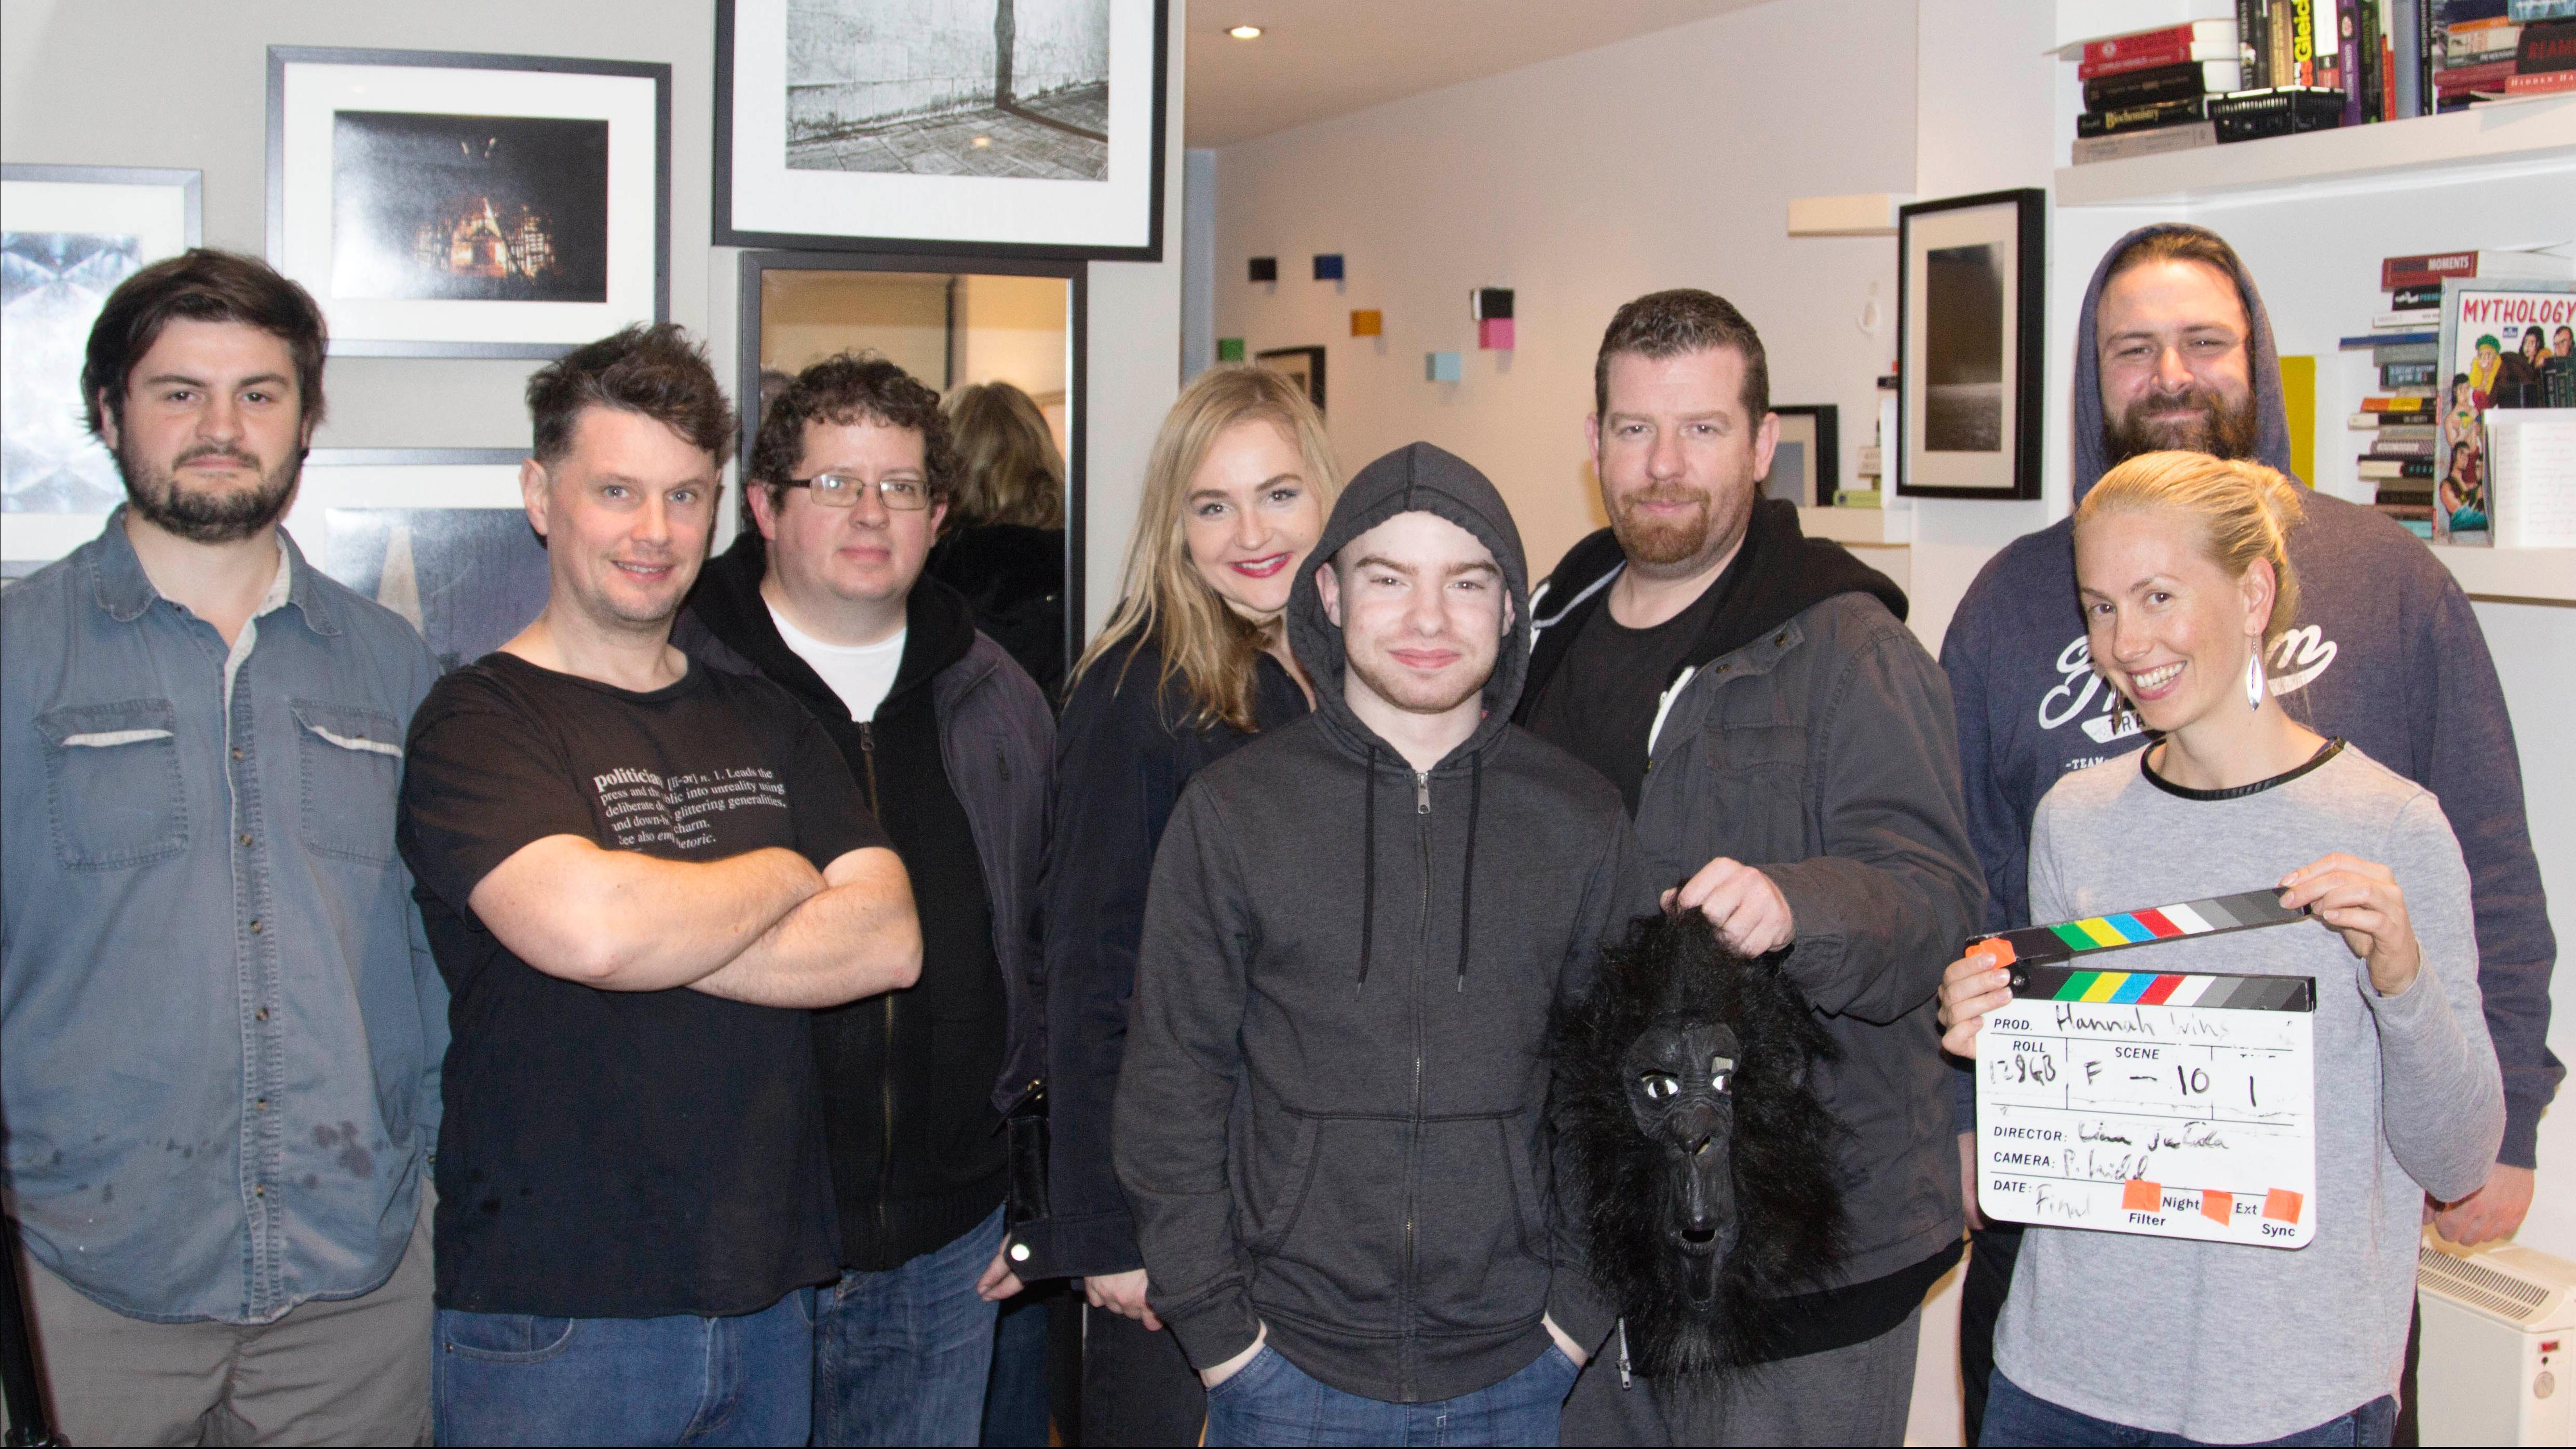 Hanna Wins cast and crew 2